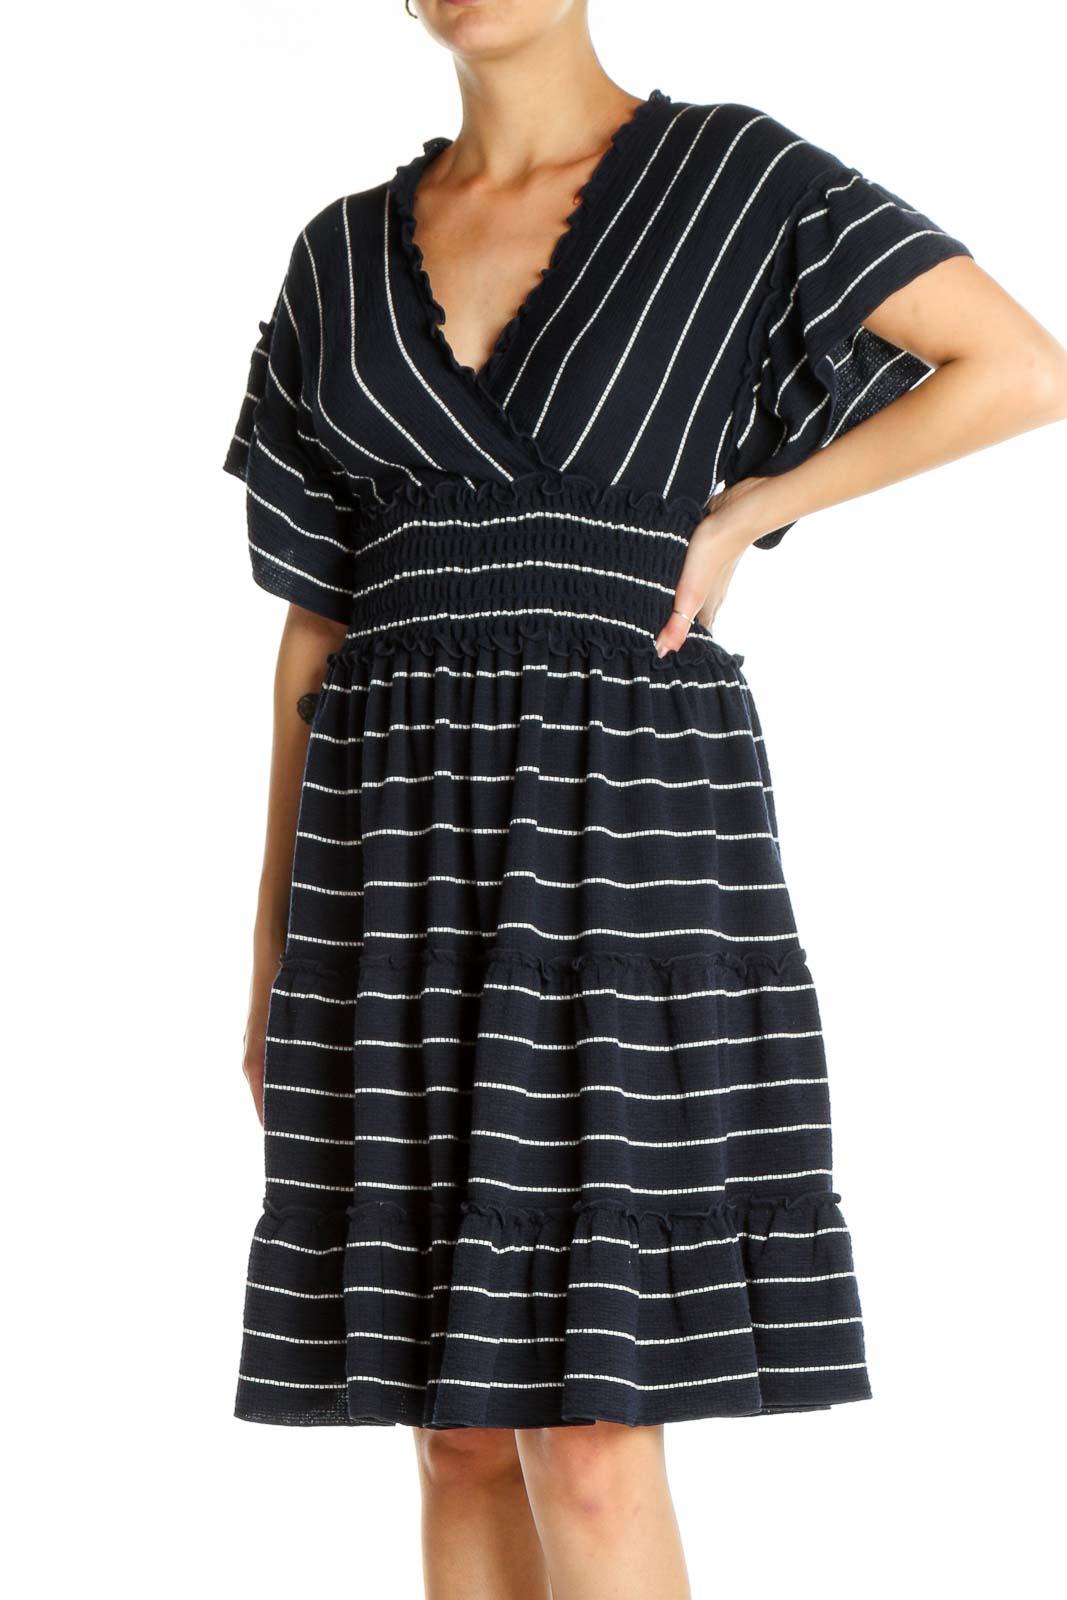 Blue Striped Dress Front